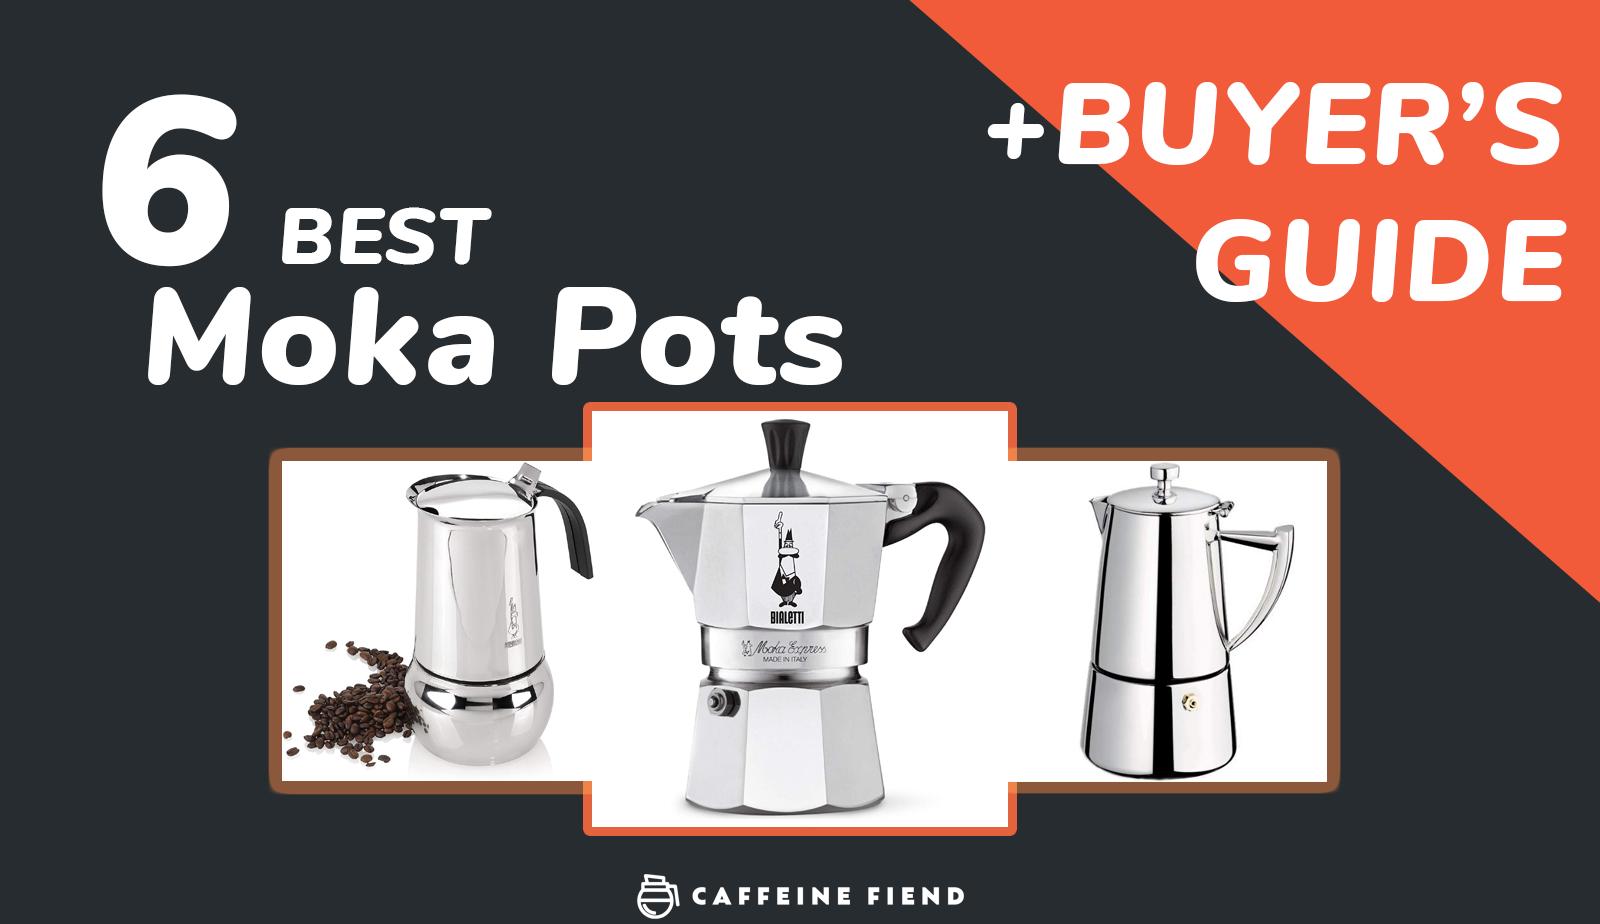 the 6 best moka pots ranked on caffeinefiend.co